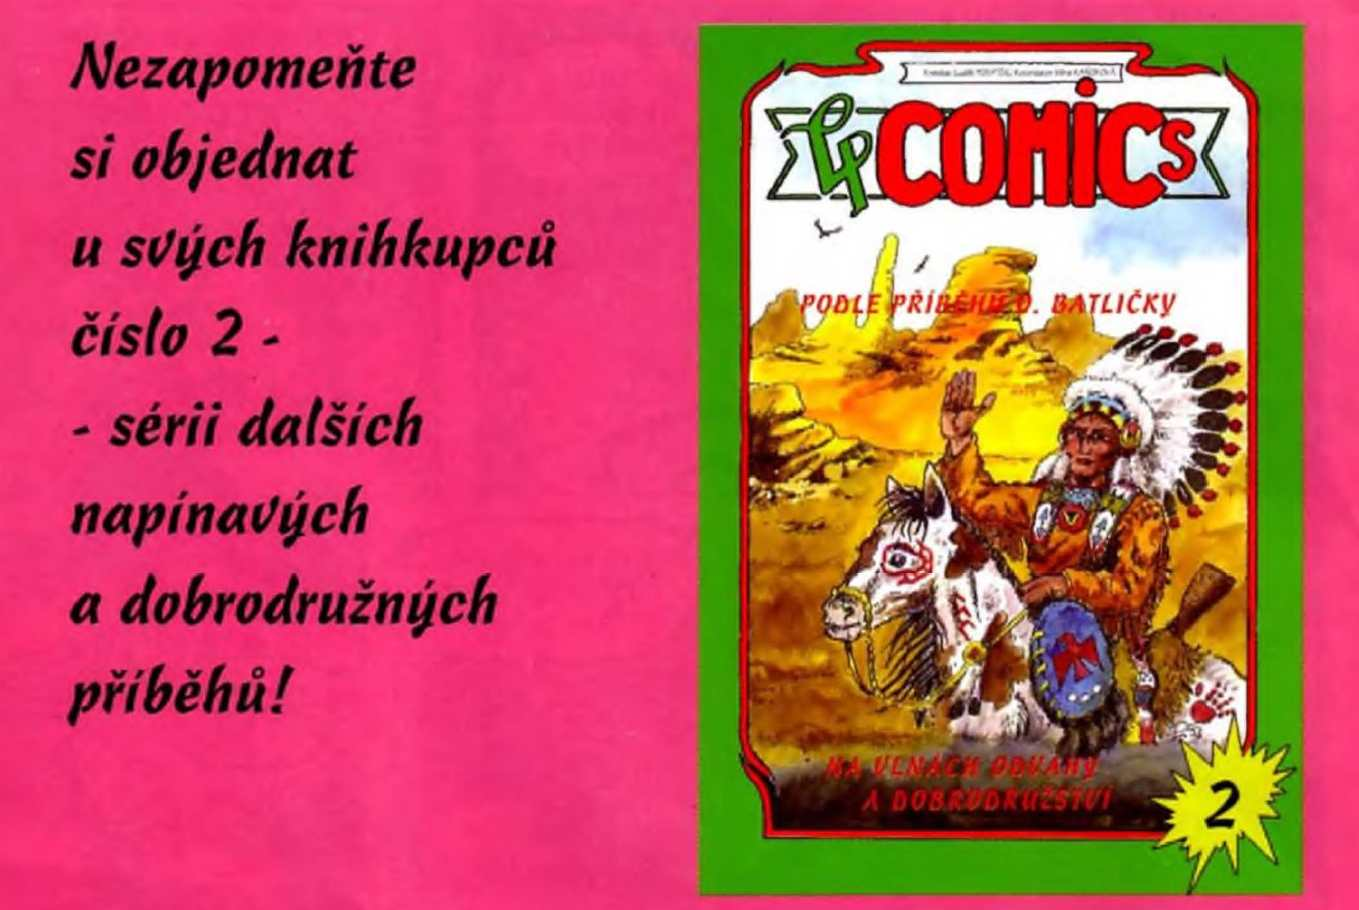 LP COMICS - 2